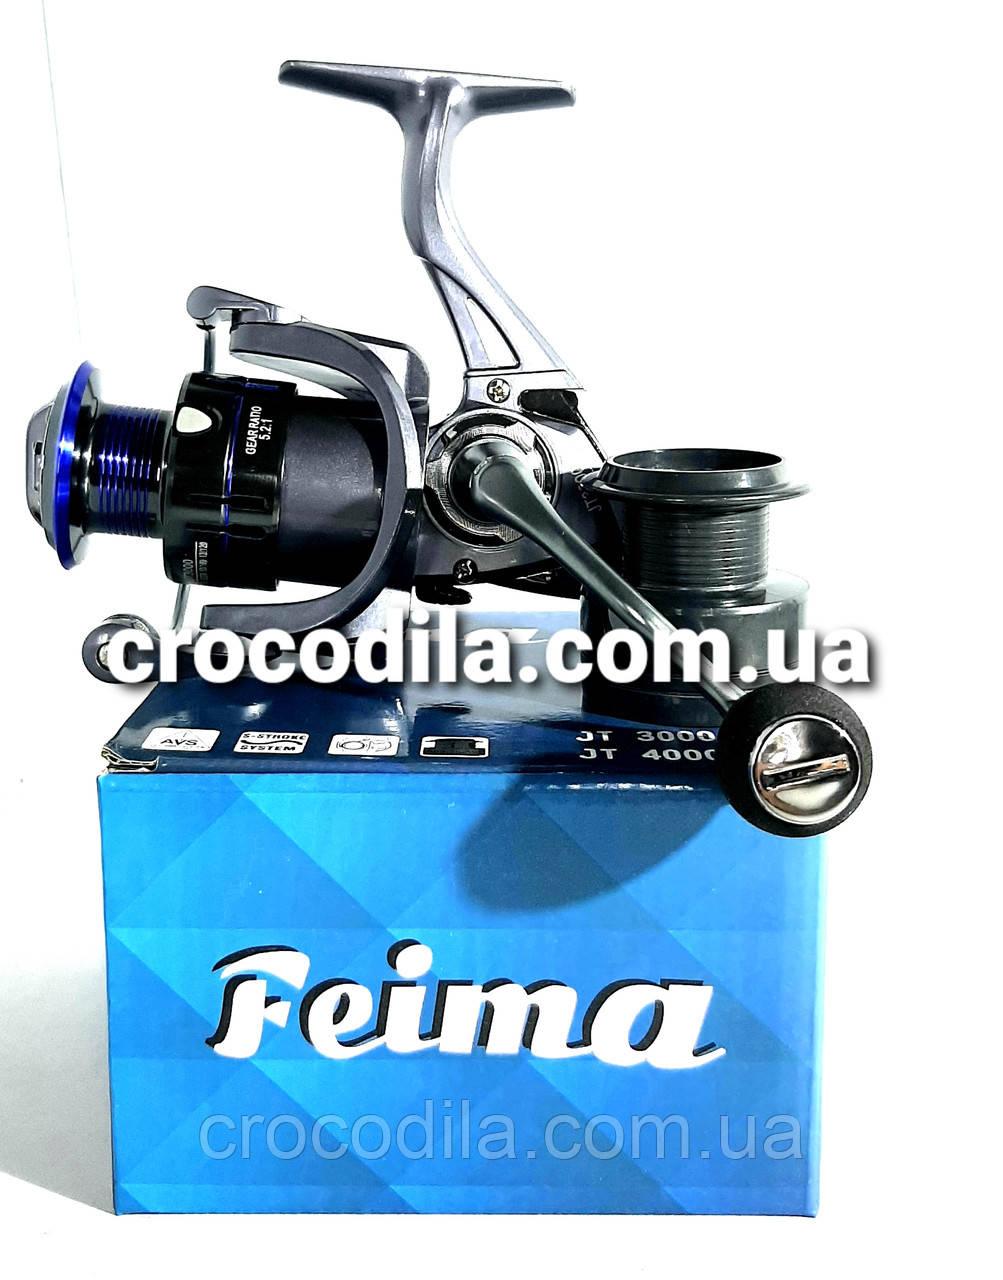 Спиннинговая катушка Feima JT 3000